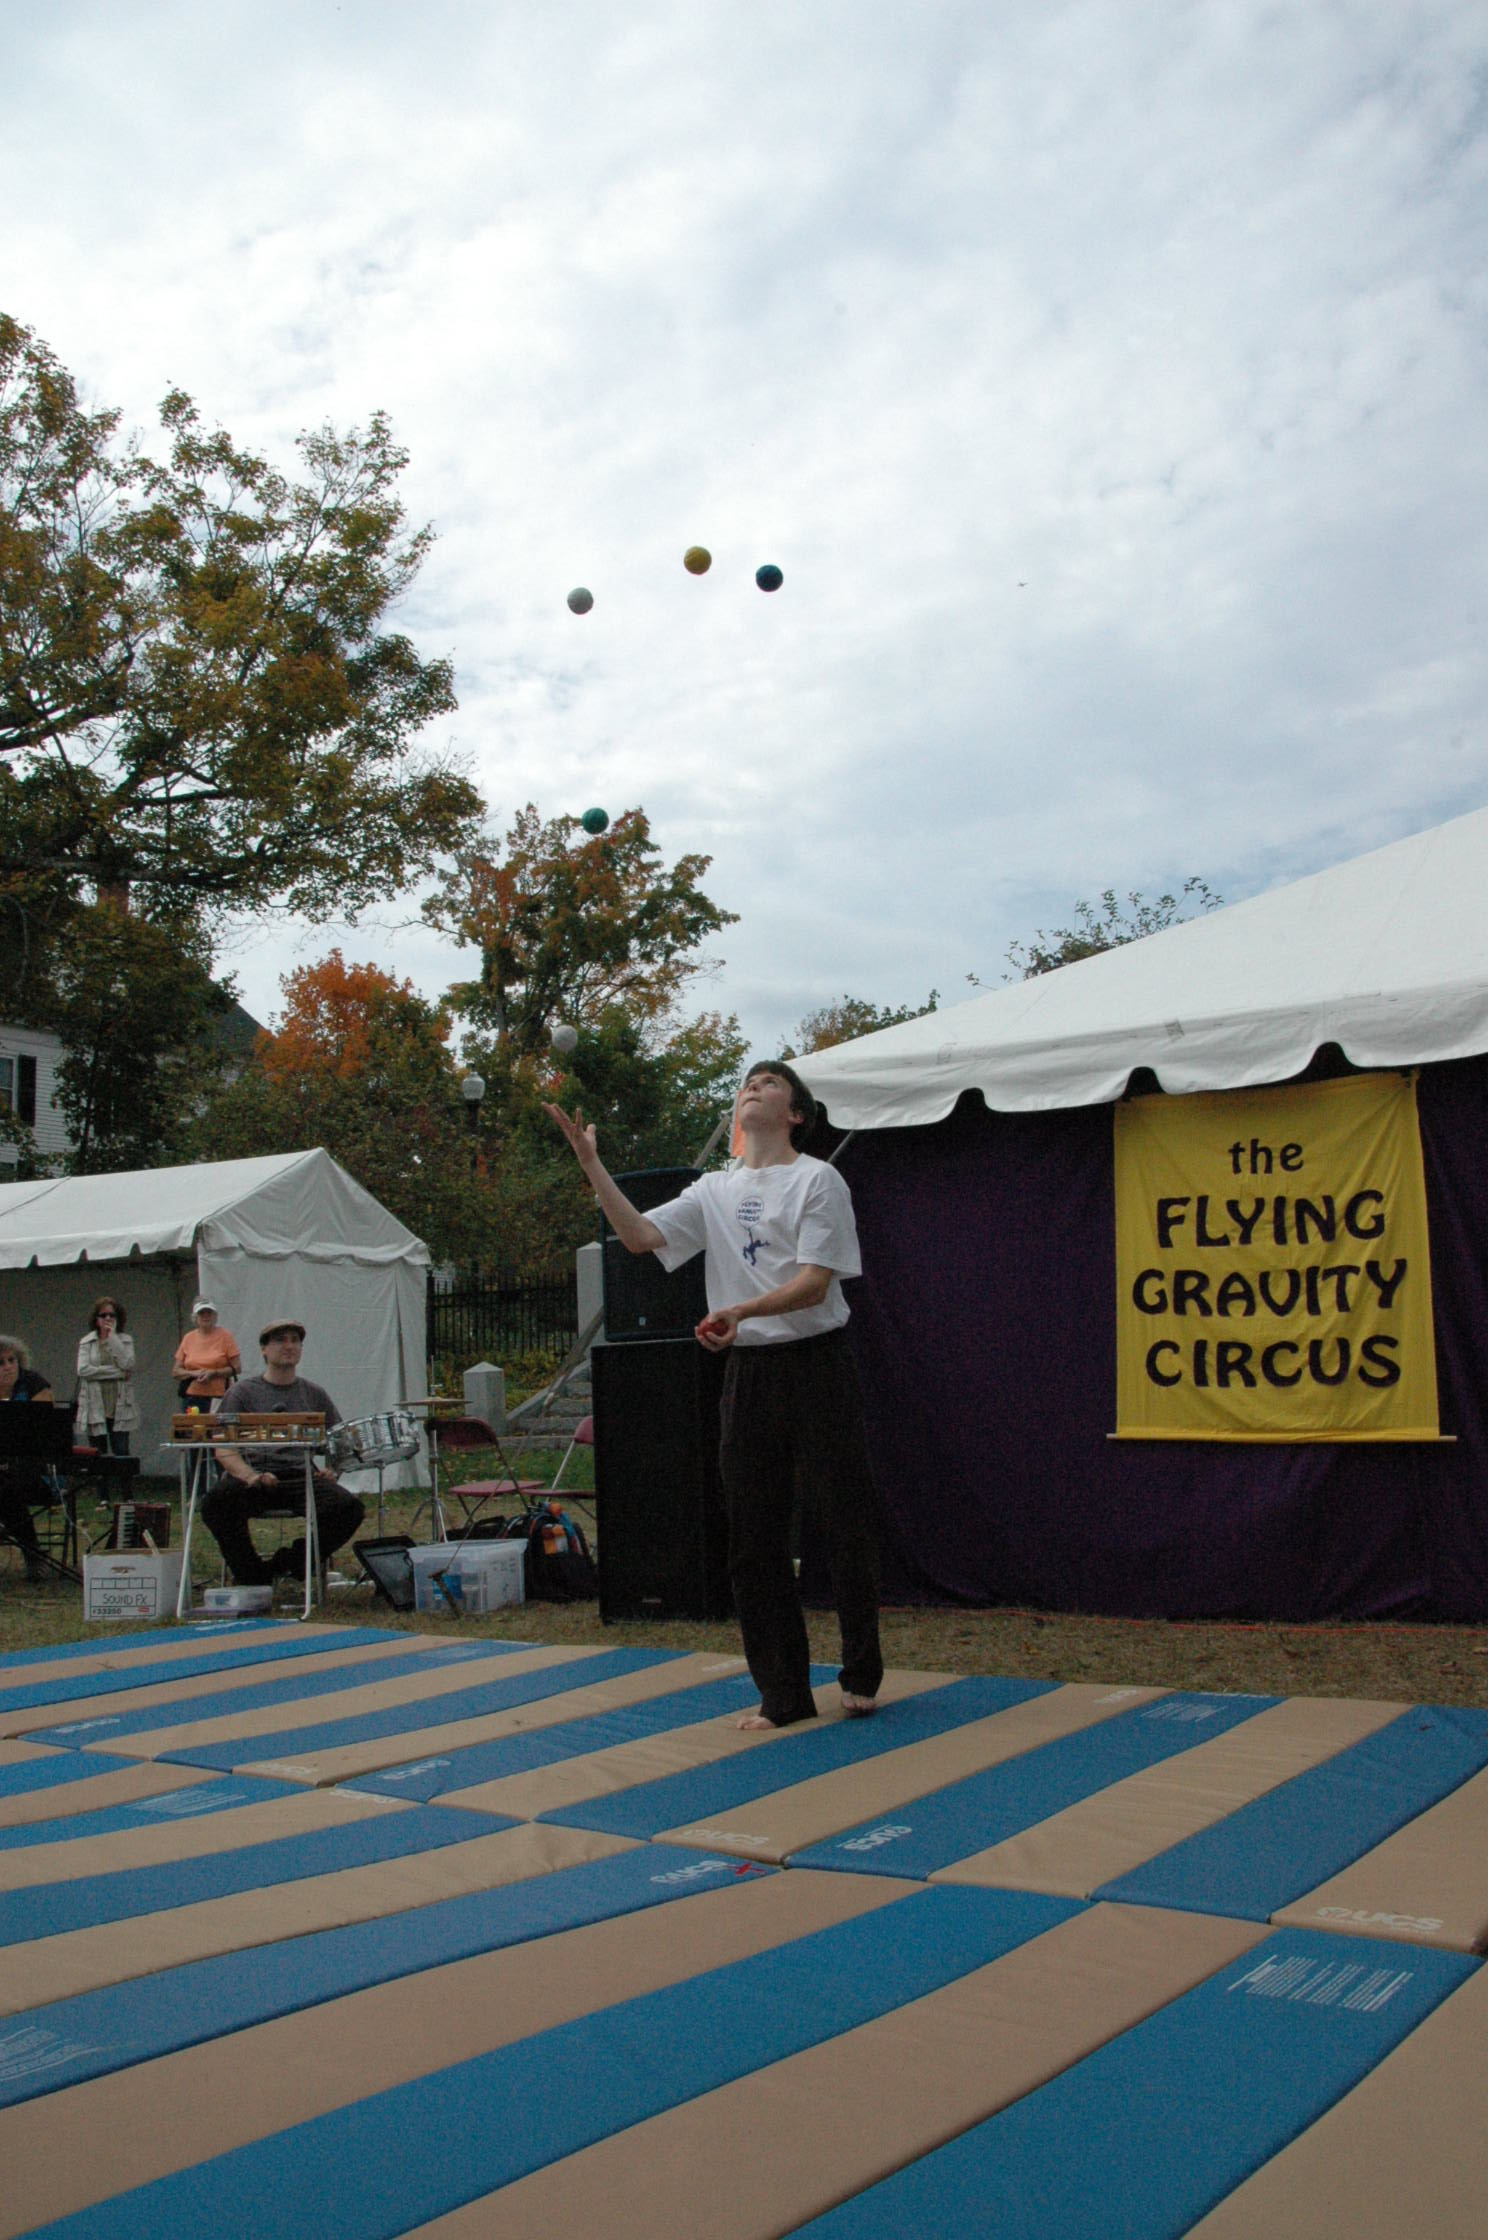 2012-10-06 Flyin Gravity Circus - Pumpkin 064.JPG